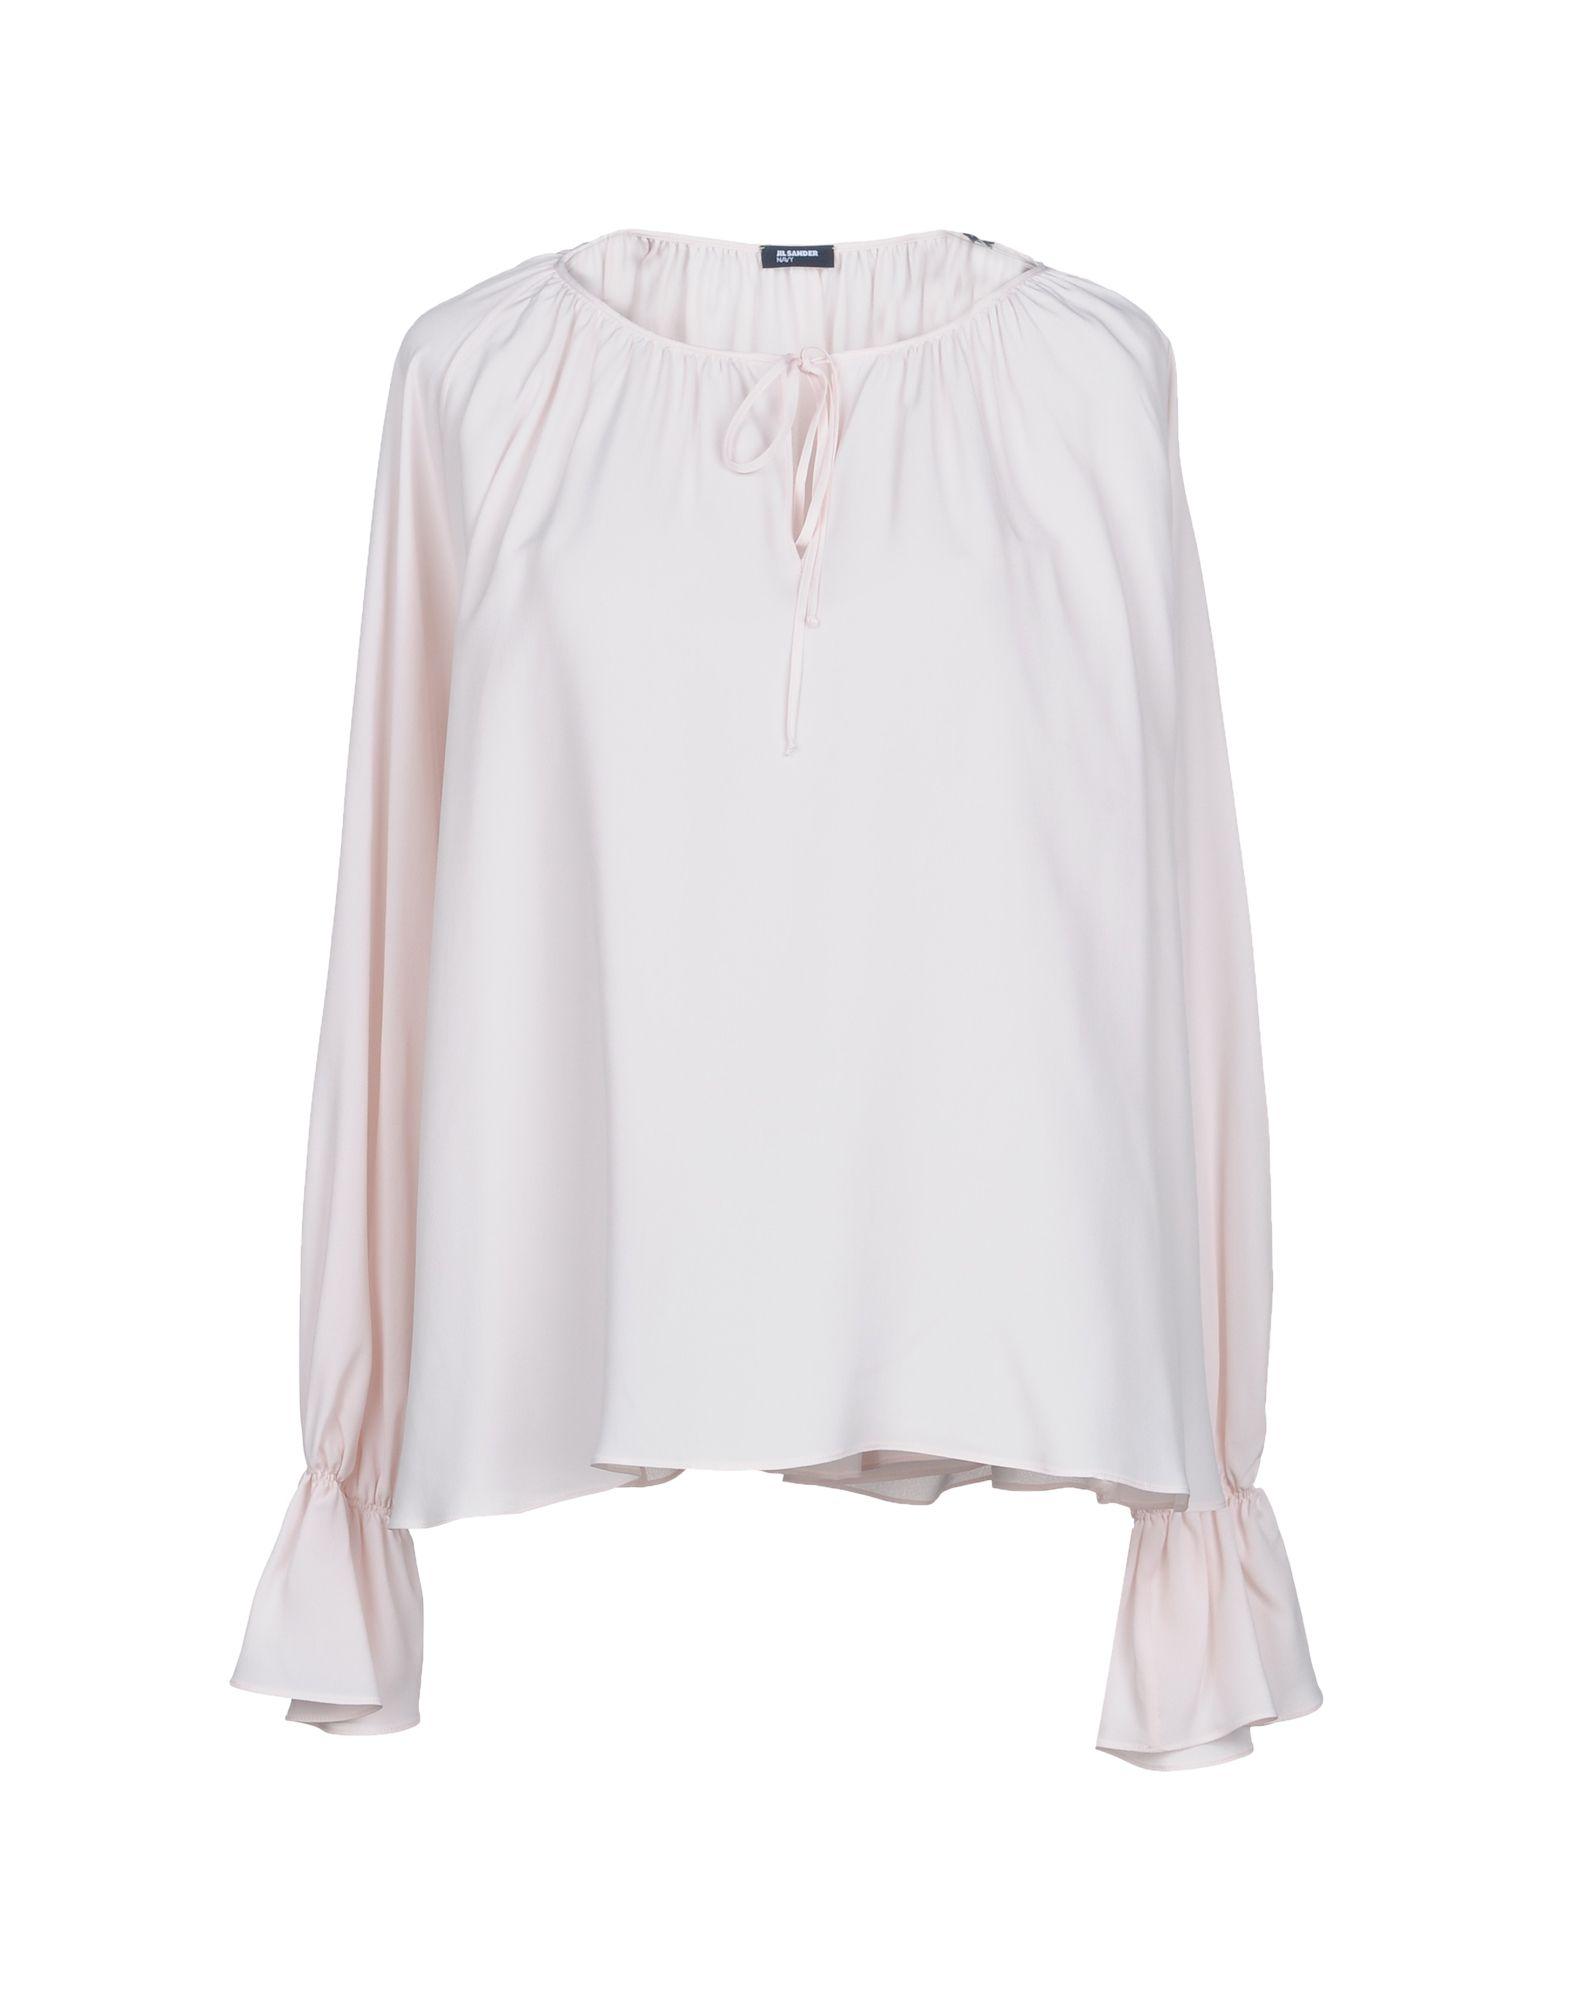 JIL SANDER NAVY Блузка перчатки eleganzza is01433 navy